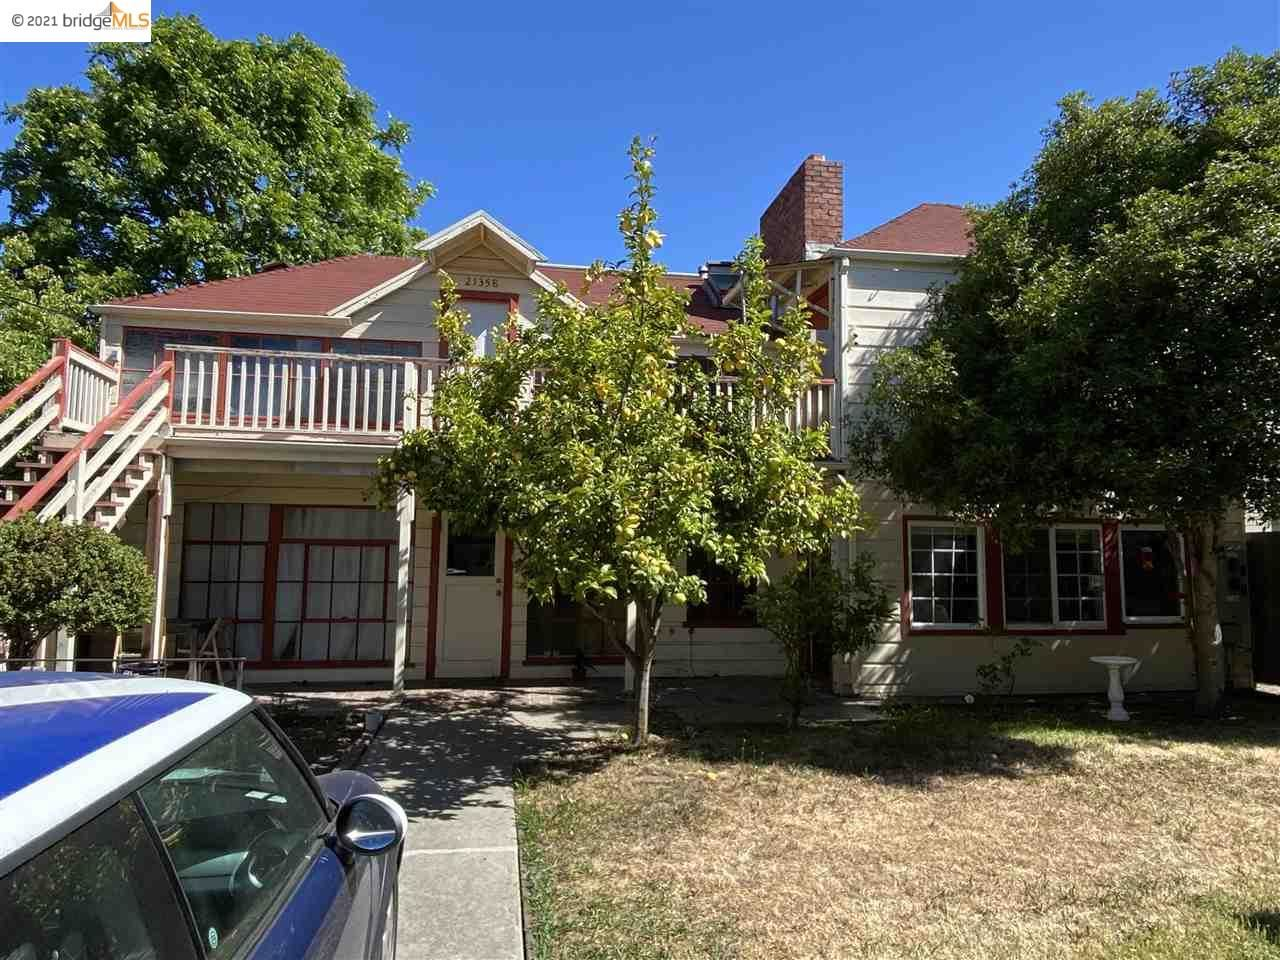 Photo of 2137 Parker St, BERKELEY, CA 94704 (MLS # 40951053)